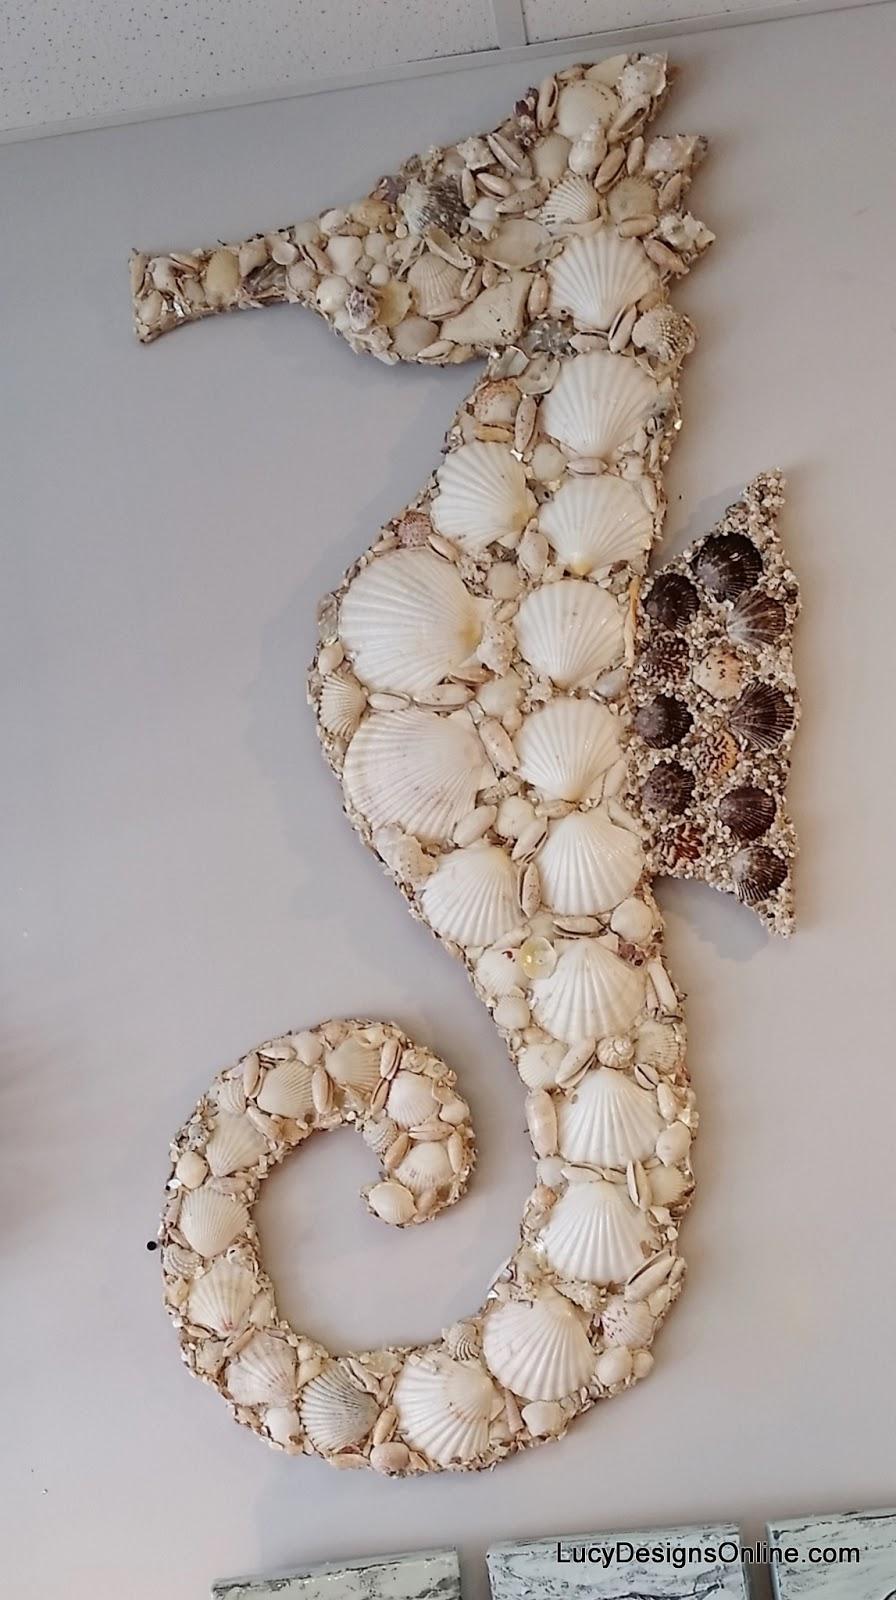 Image gallery mosaic seashell art for Seashell mosaic art